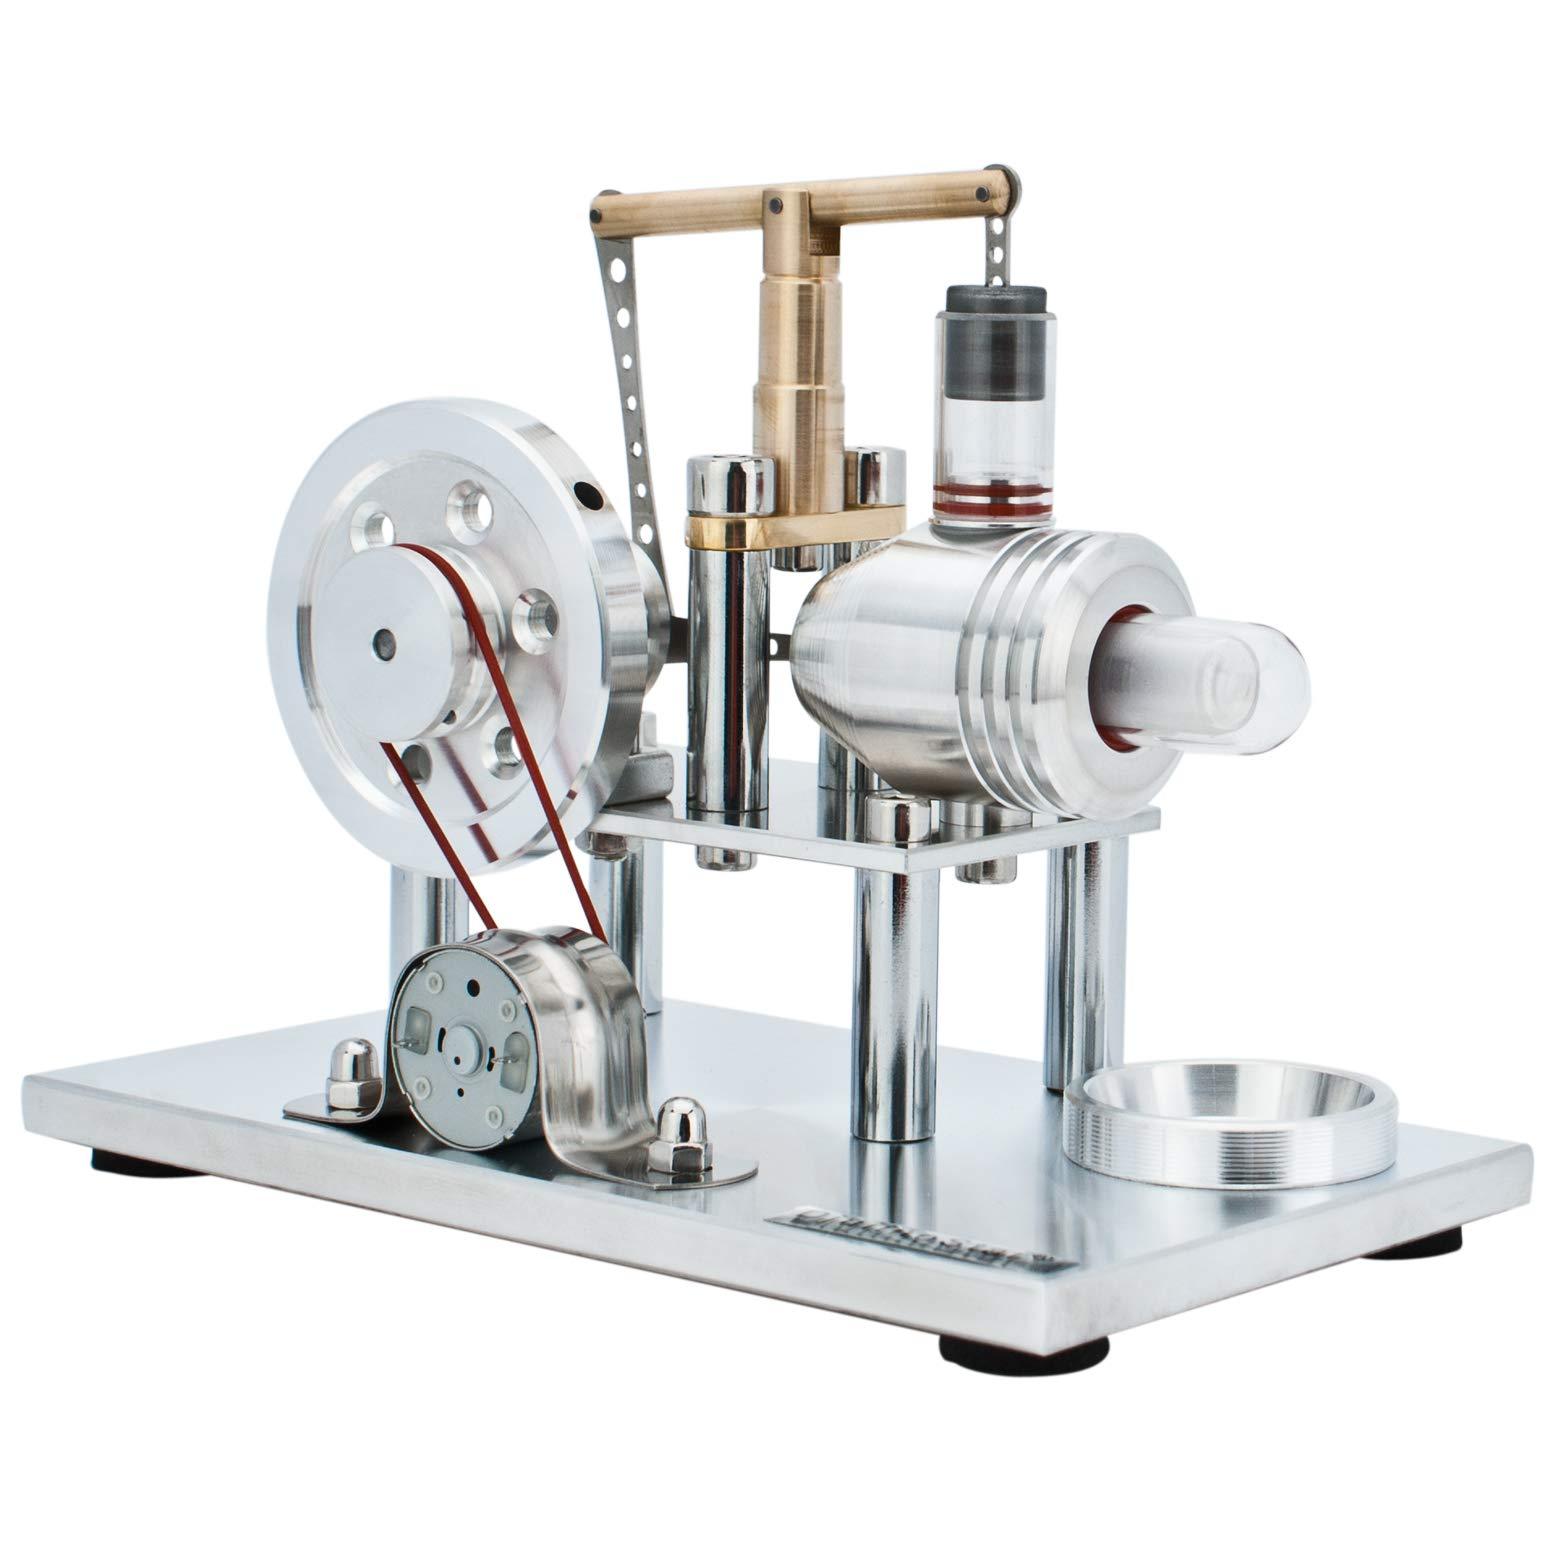 DjuiinoStar Hot Air Stirling Engine, Solid Metal Construction, Electricity Generator (DHA-BG-405)